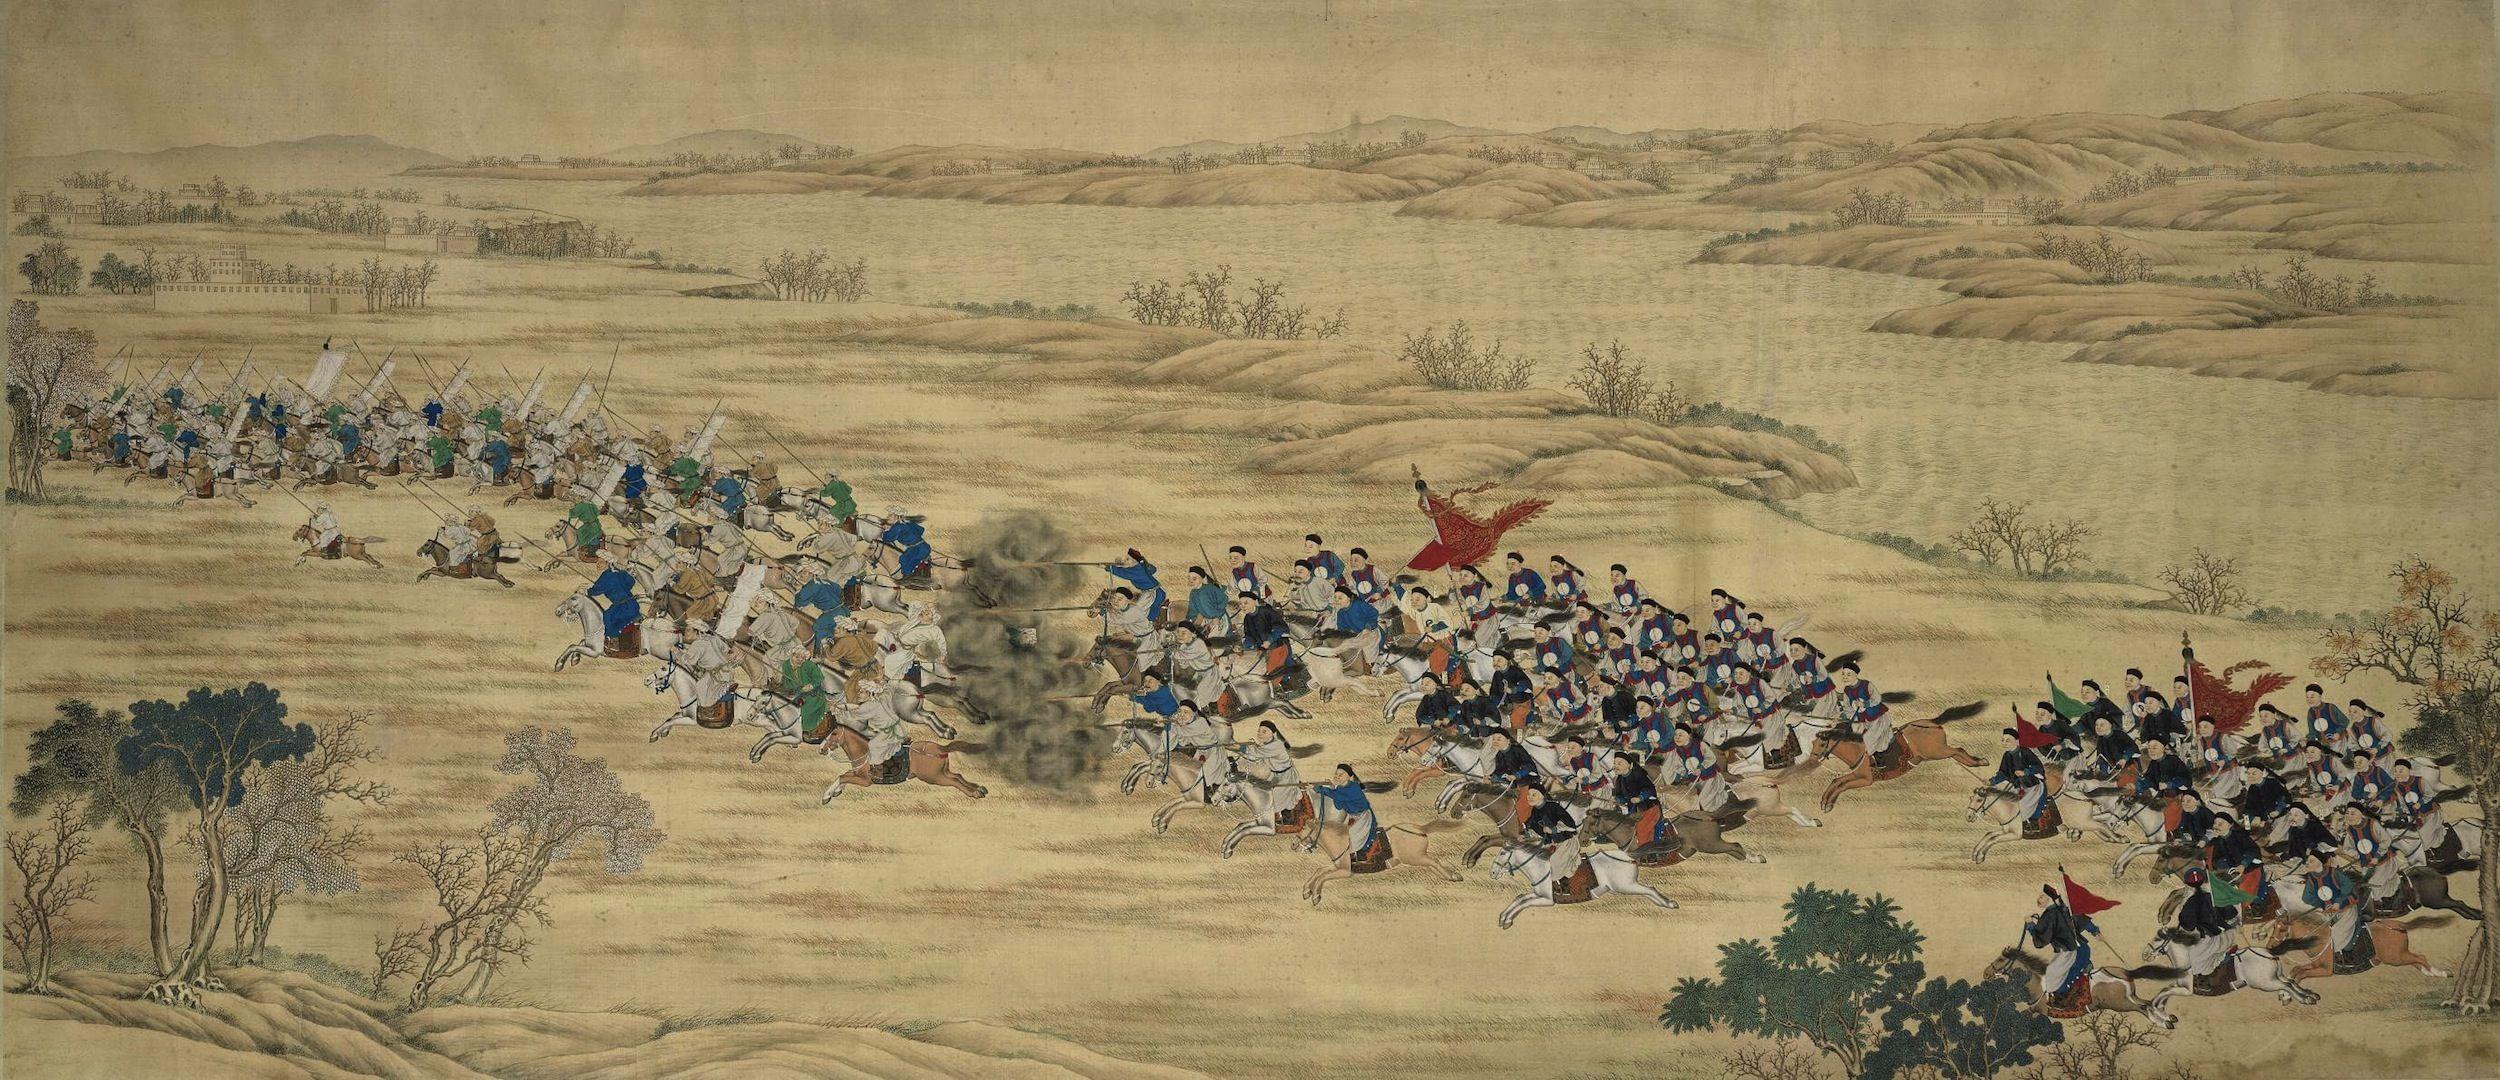 ancient chinese battle art - Google Search   Ayzenberg ...